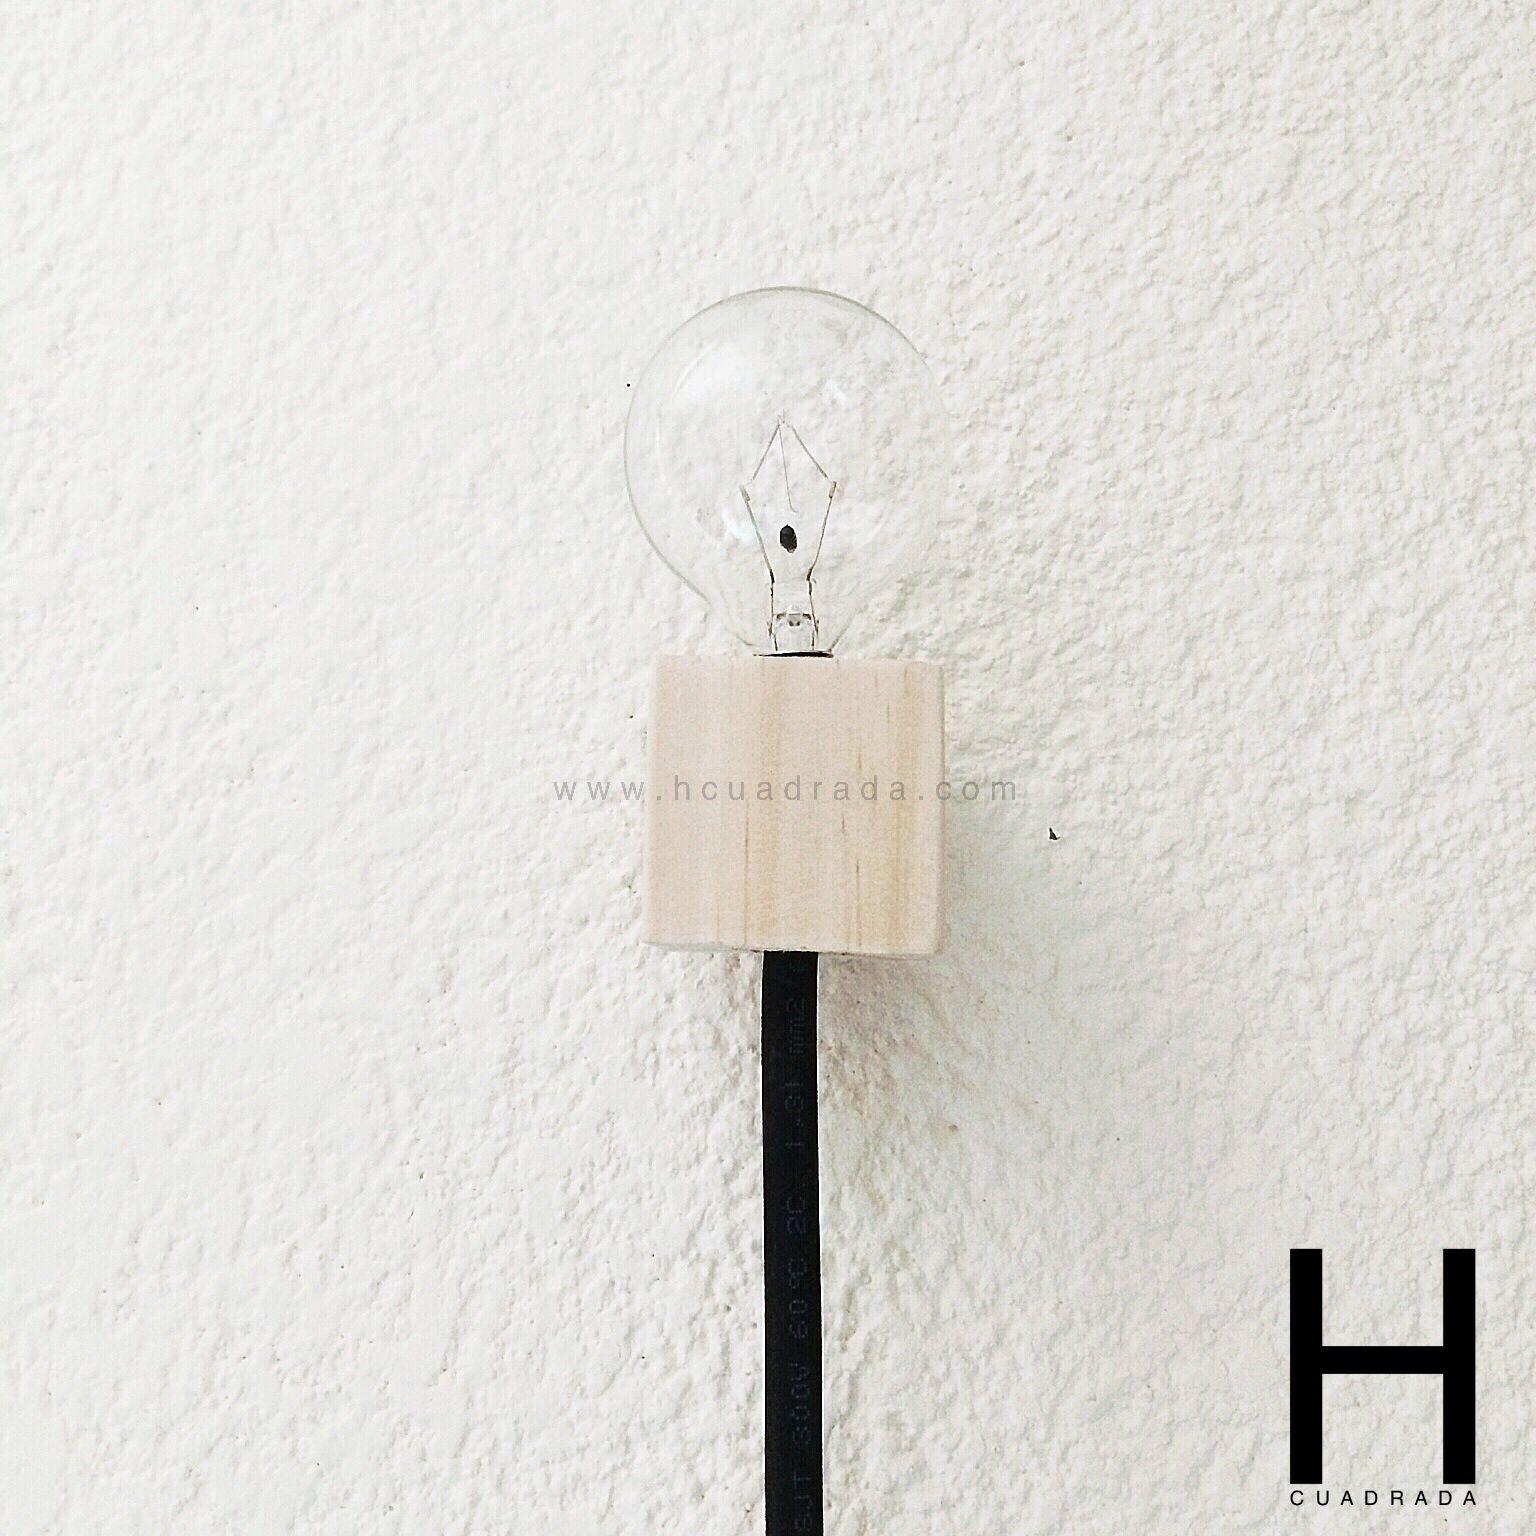 Foco flotante #venta #lampara #madera #diseno #minimalista #arquitectos #lamp #wood #design #minimalism #architects #hcuadrada